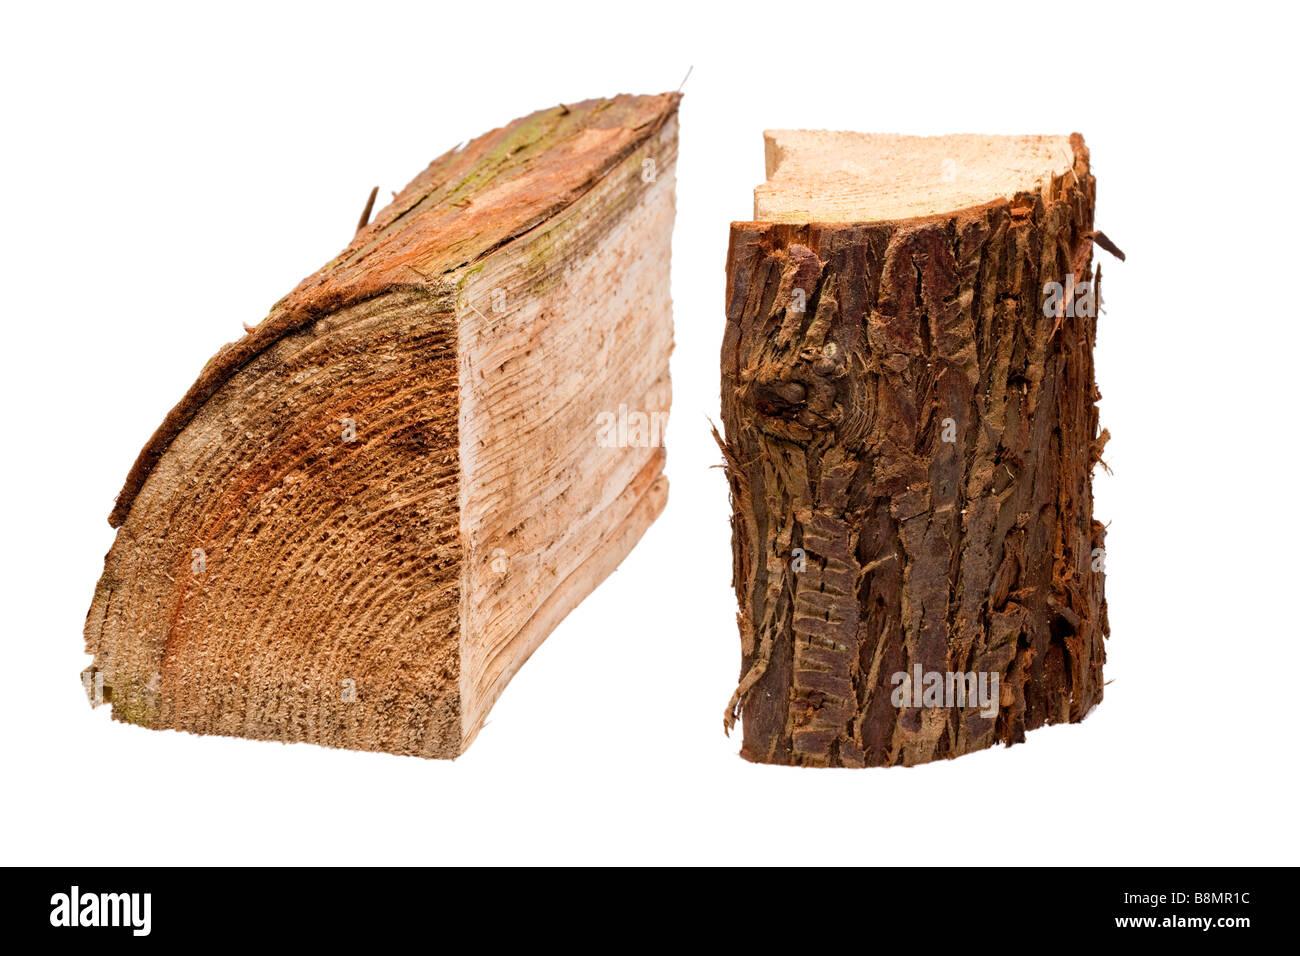 Cut logs on white cutout - Stock Image